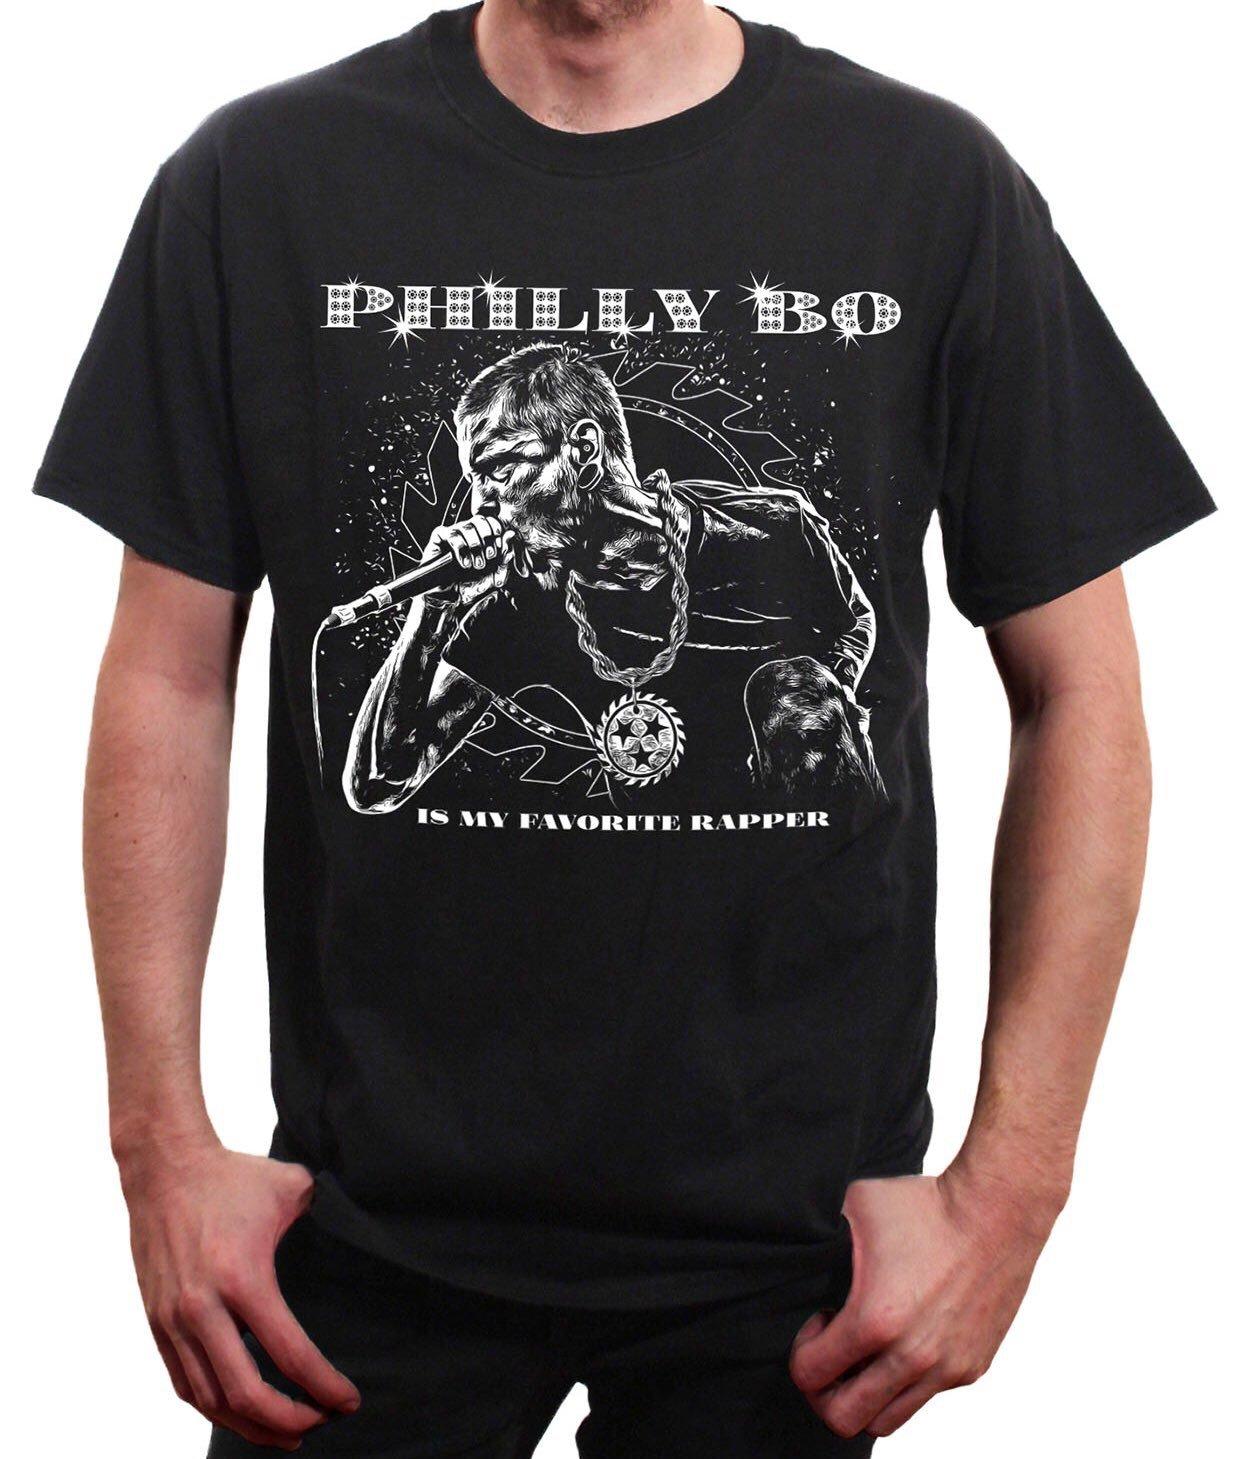 Image of PHIL BOZEMAN IS MY FAVORITE RAPPER T-SHIRT